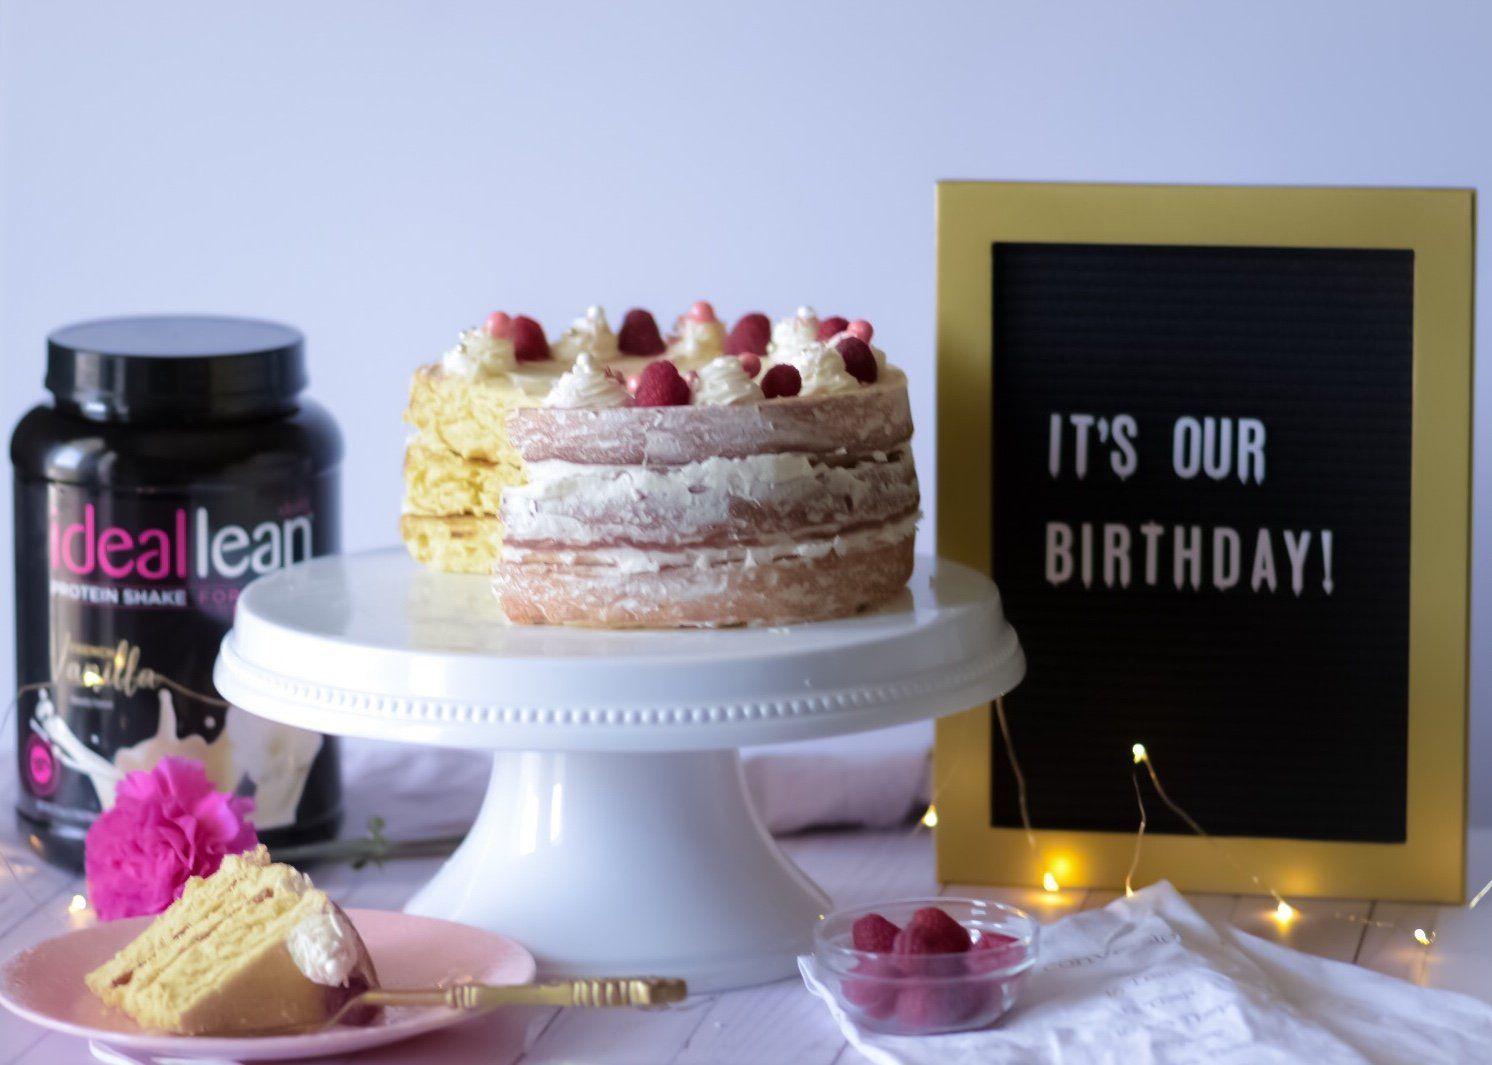 Swell Birthday Recipes Cake Food Recipes Birthday Birthday Cards Printable Opercafe Filternl